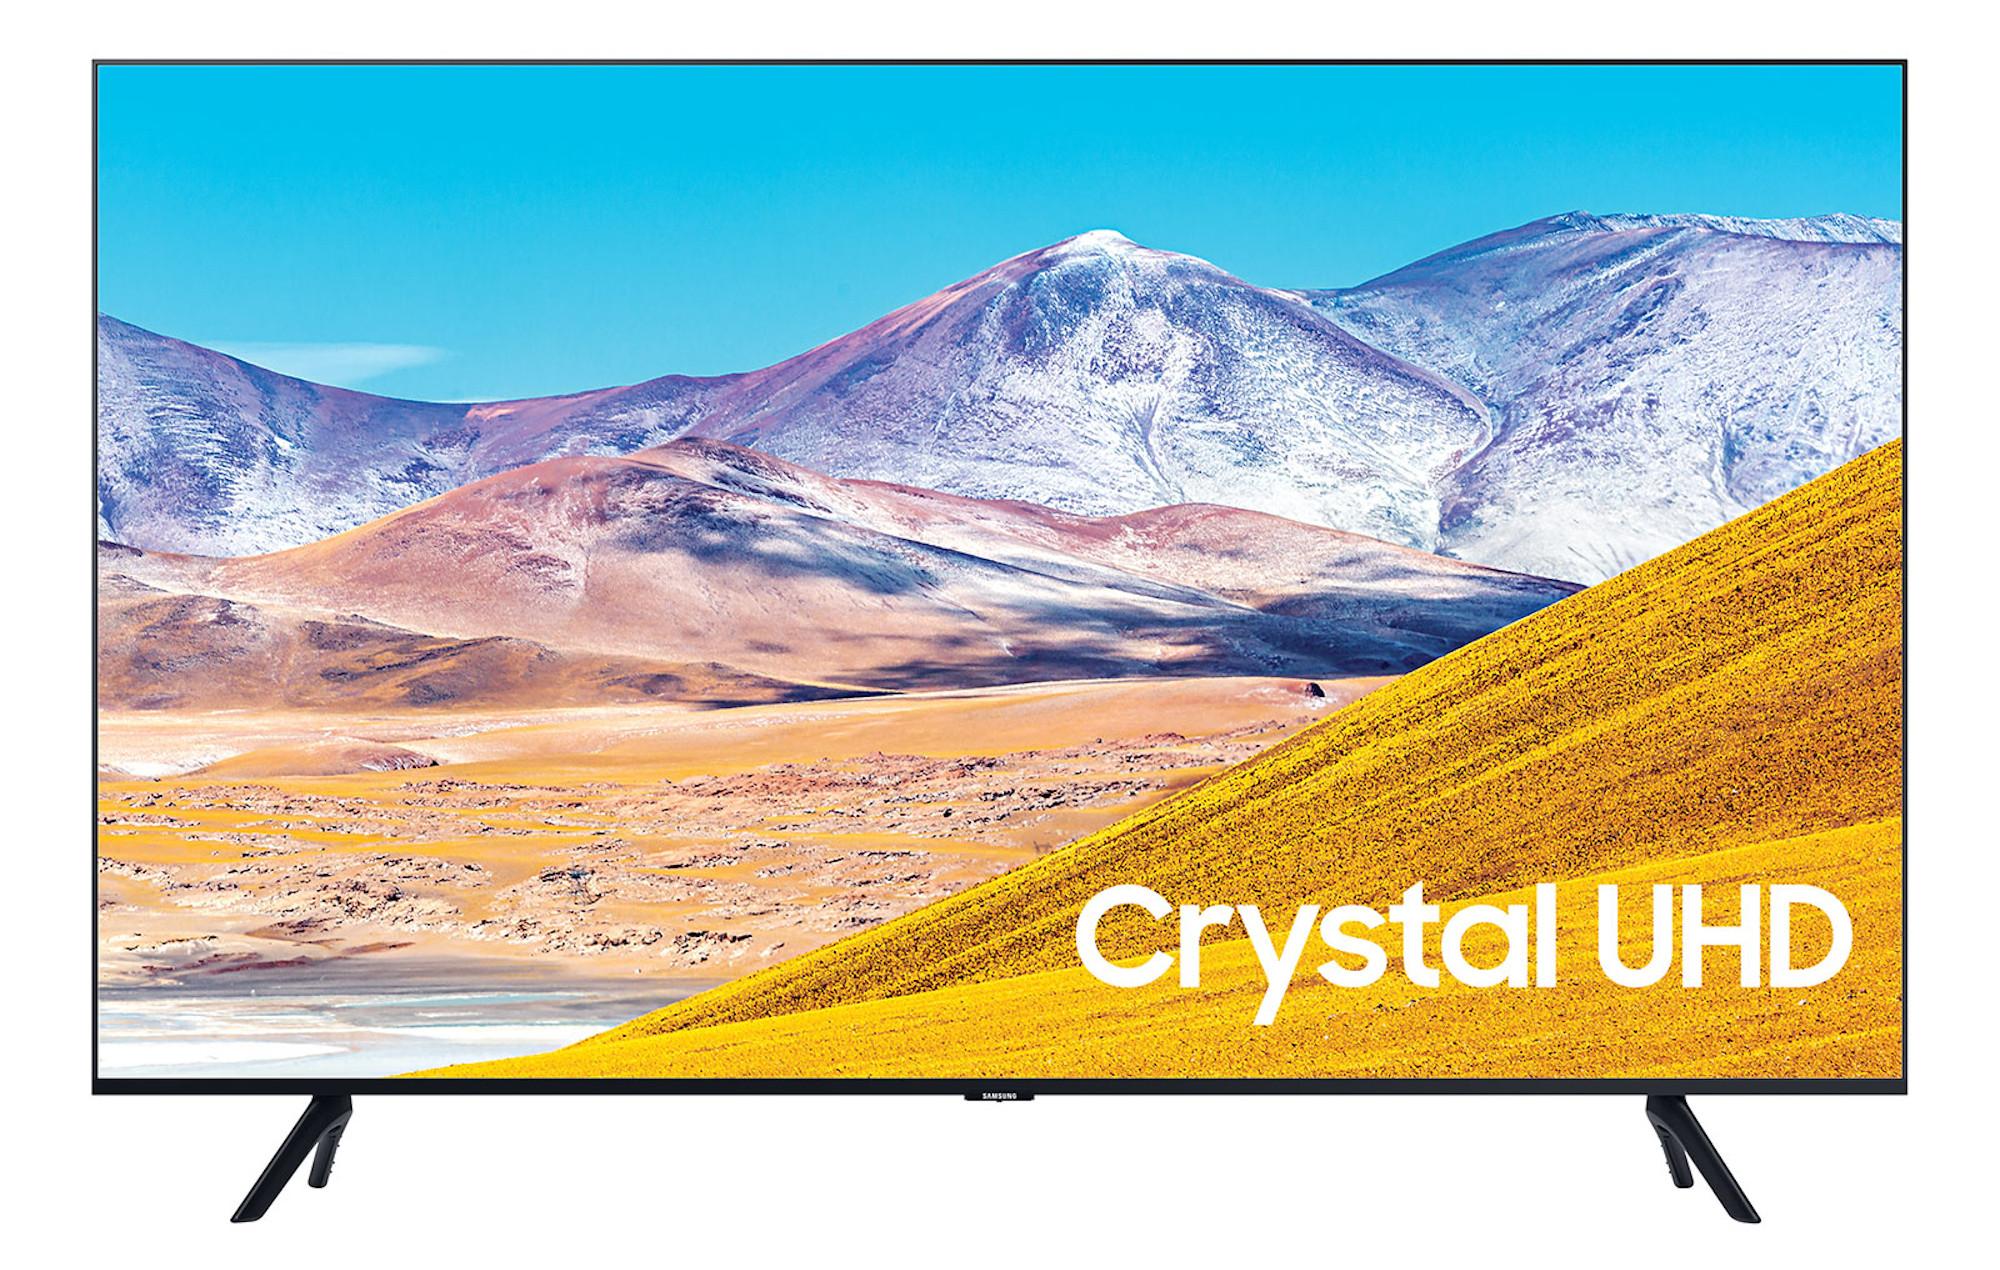 Samsung TU8000 Crystal UHD 4K Smart TV